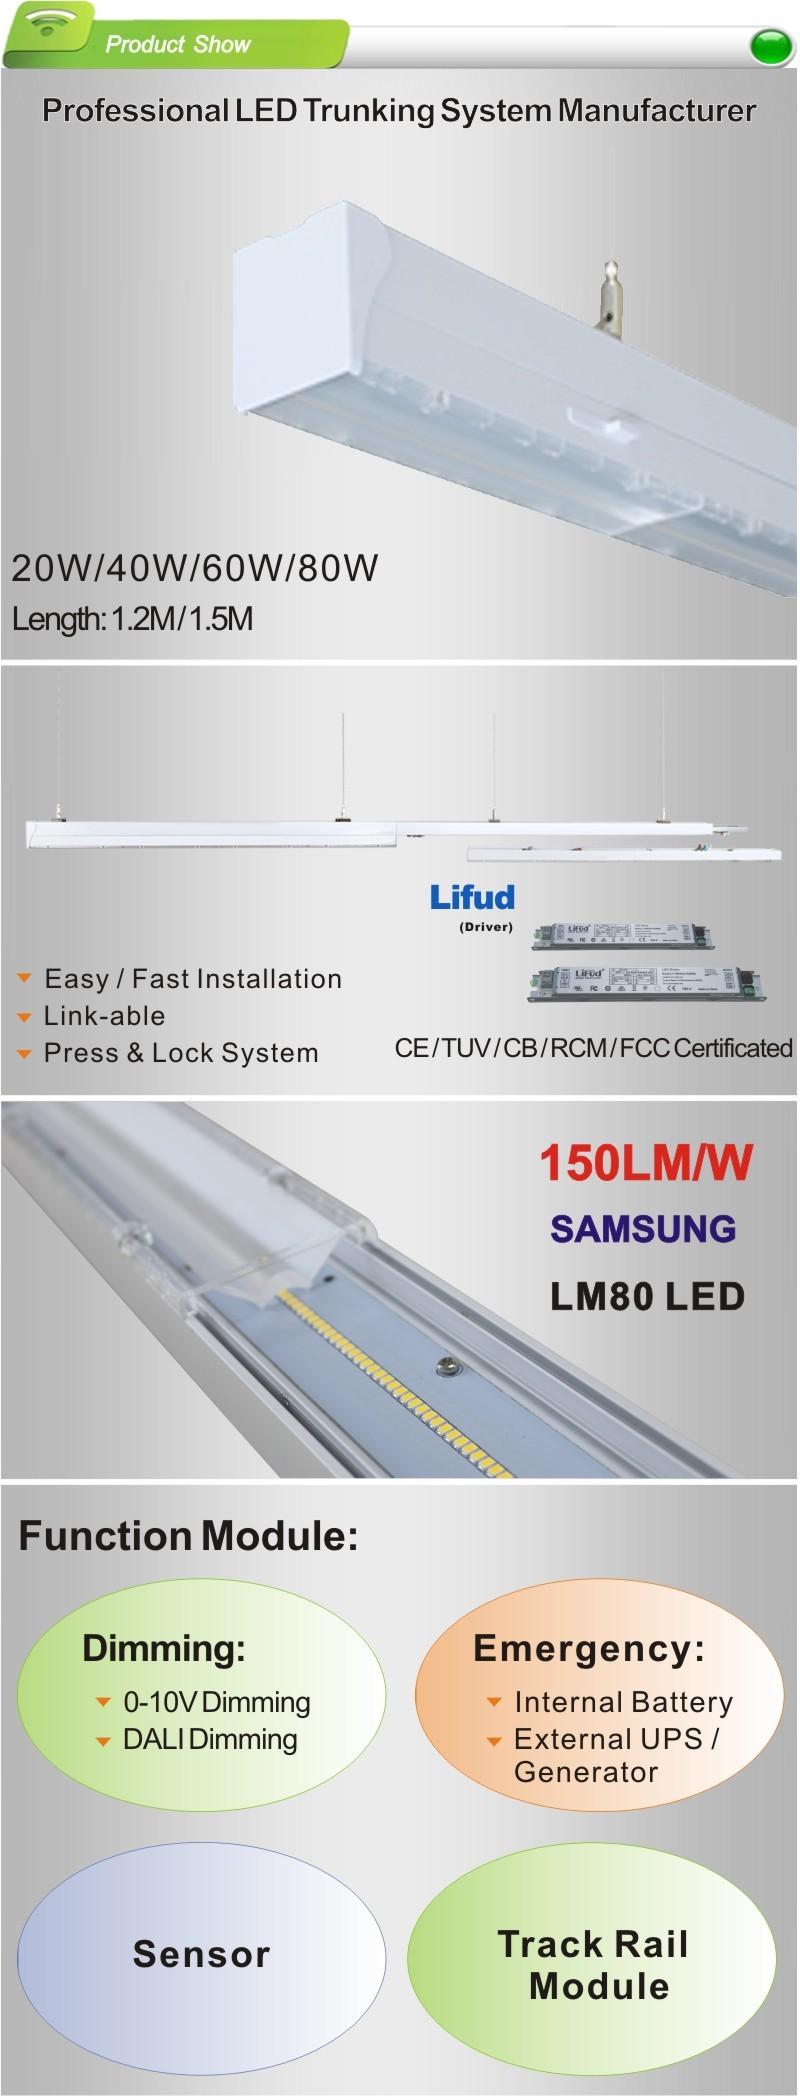 LED Linear Light System Descirption 11